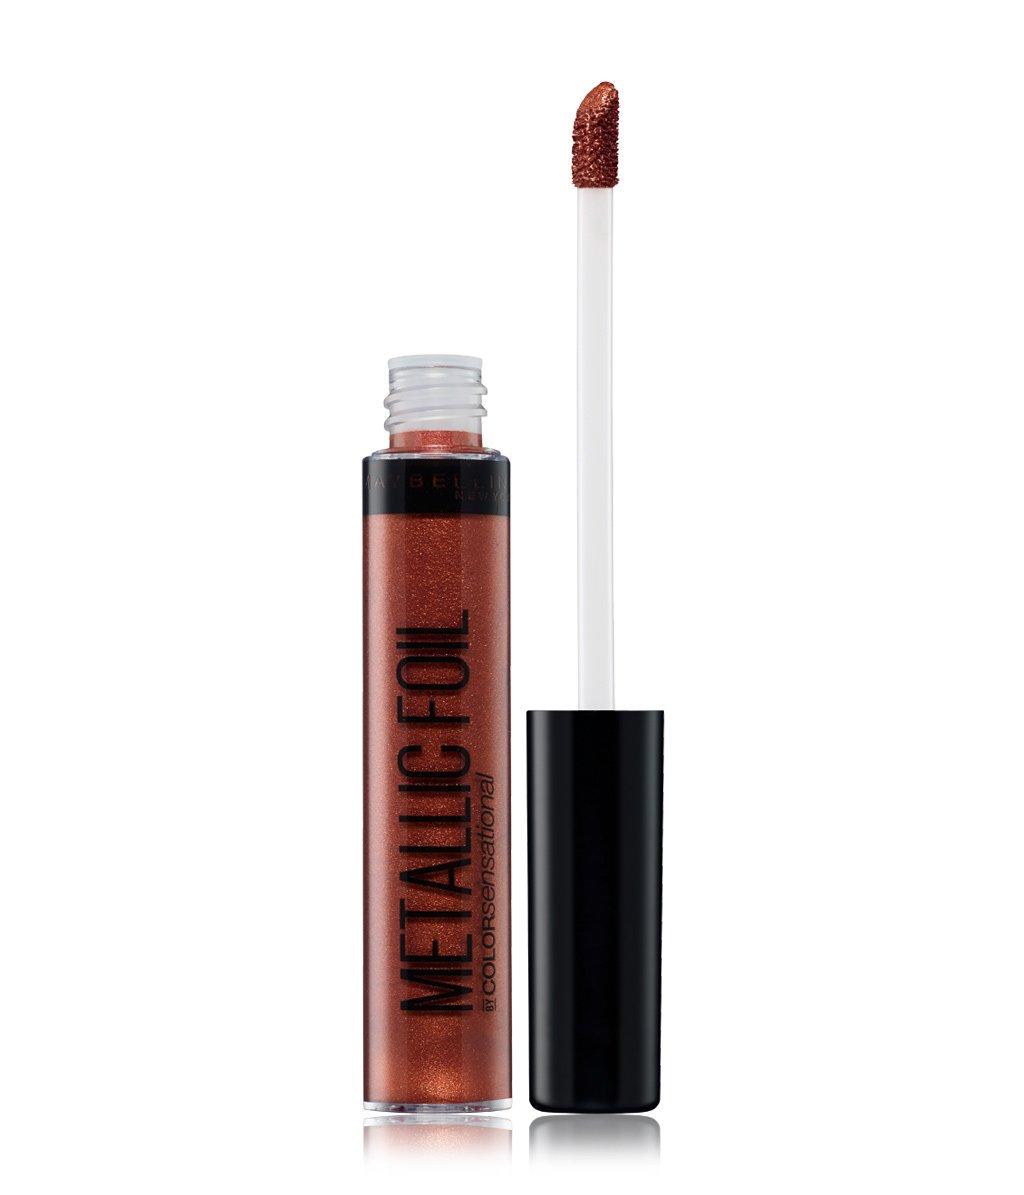 Maybelline Color Sensational Metallic Foil Liquid Lipstick Bestellen  Flaconi-5675